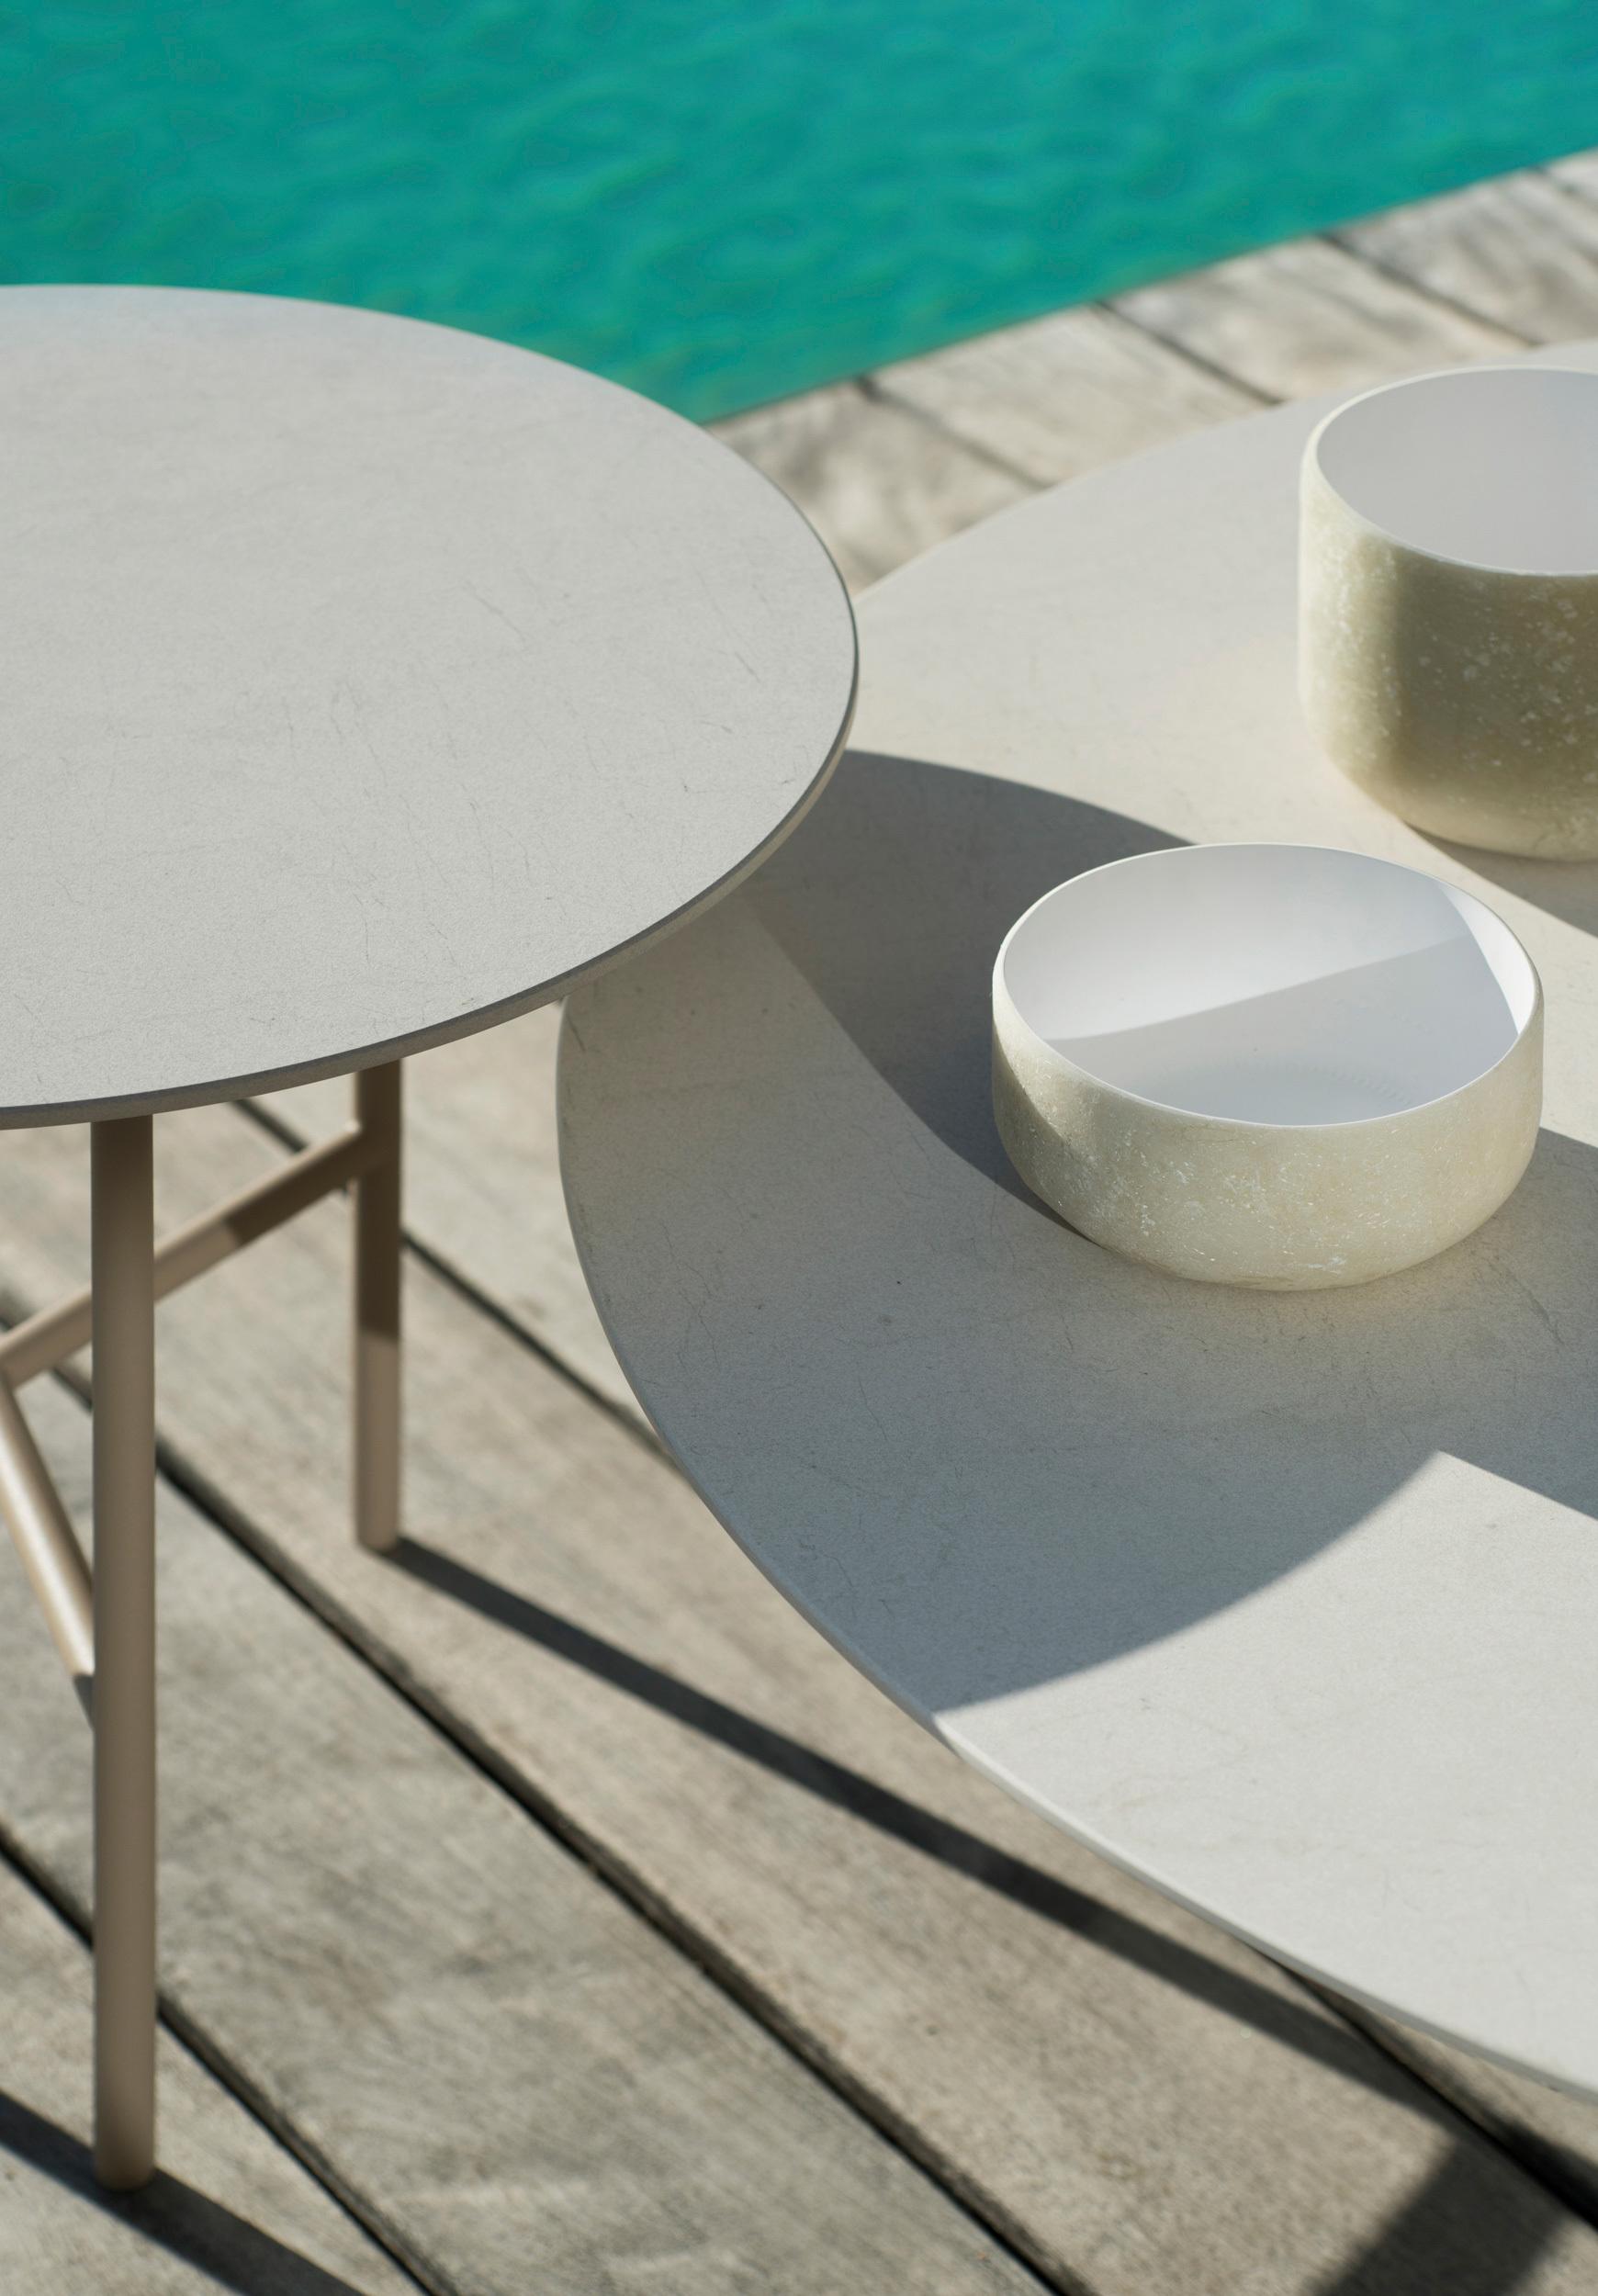 - Grada Outdoor Round Coffee Table C916 By Expormim STYLEPARK